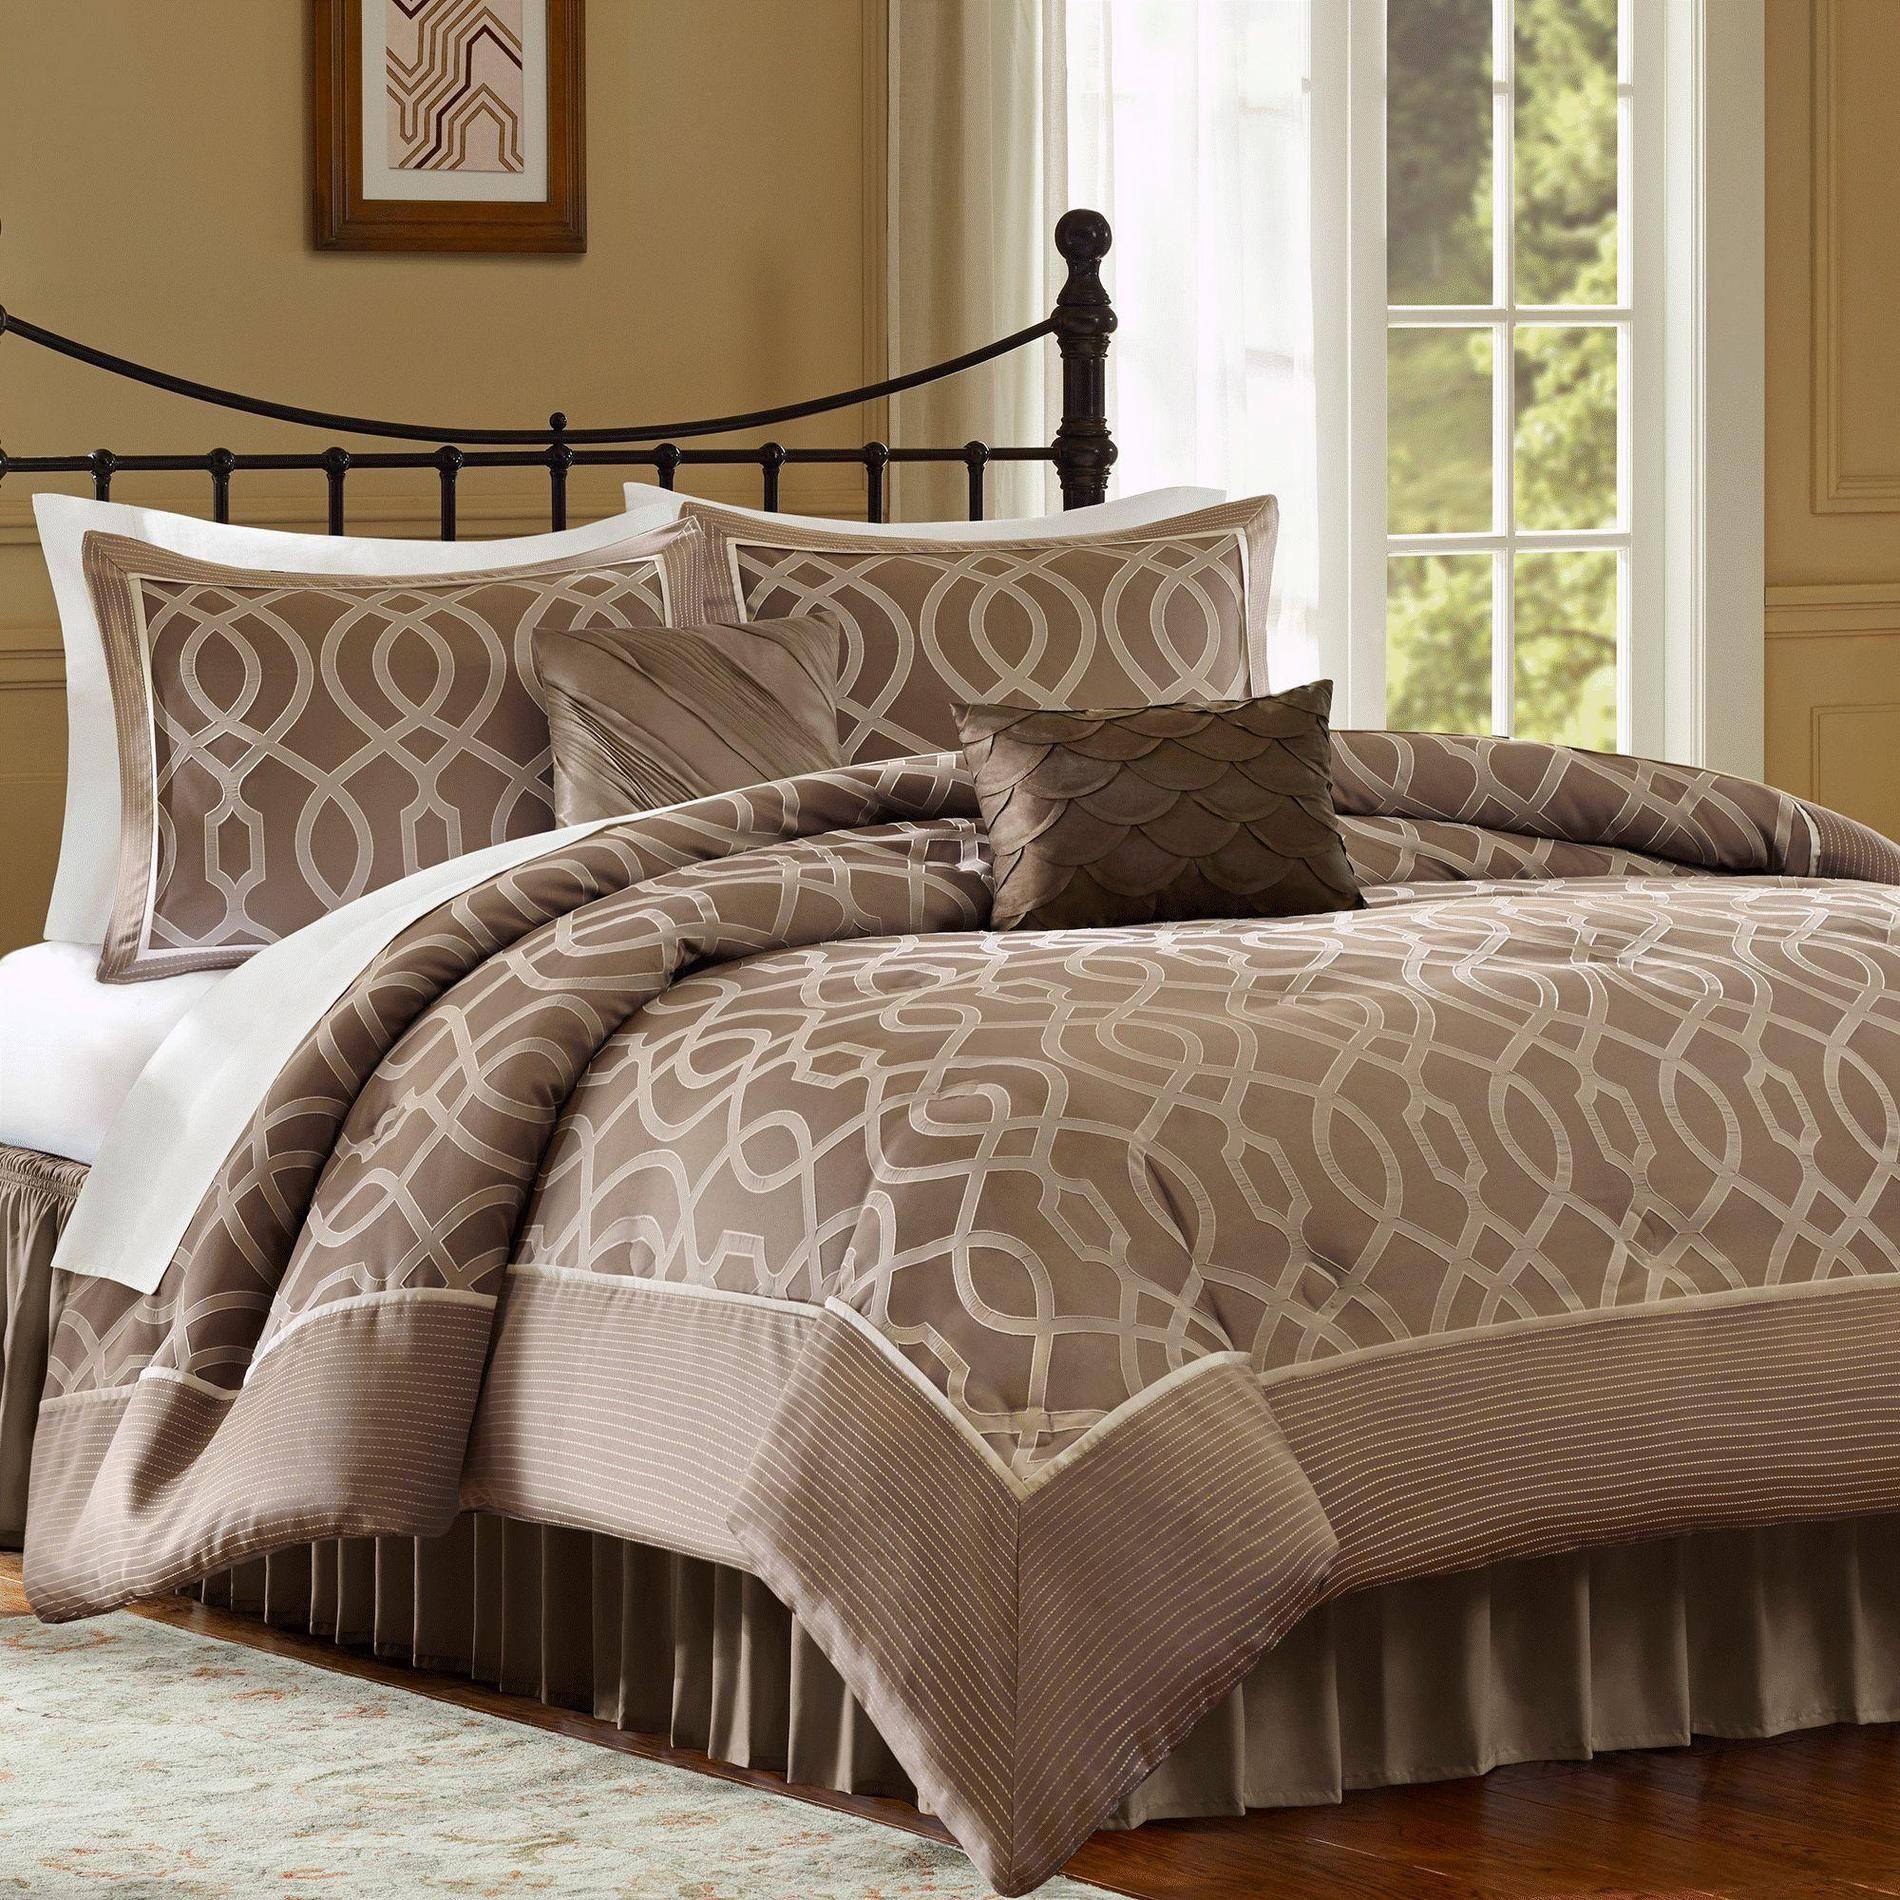 Jaclyn Smith 4Piece Ogee Comforter Set 59.99 Kmart